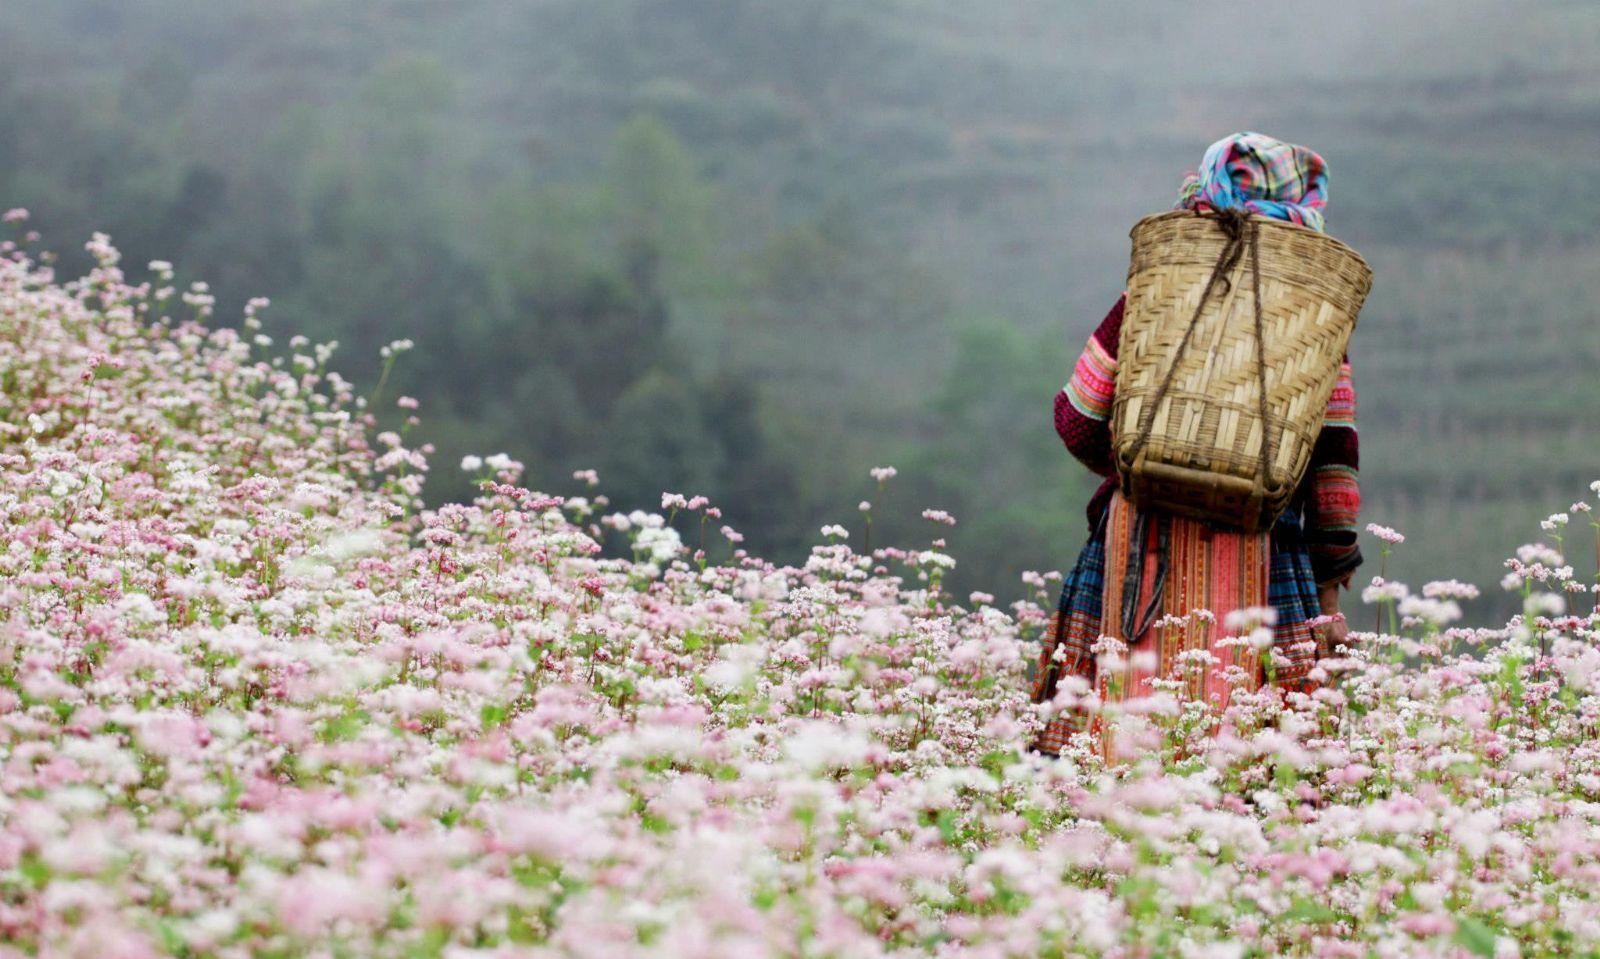 1. The Buckwheat blossom